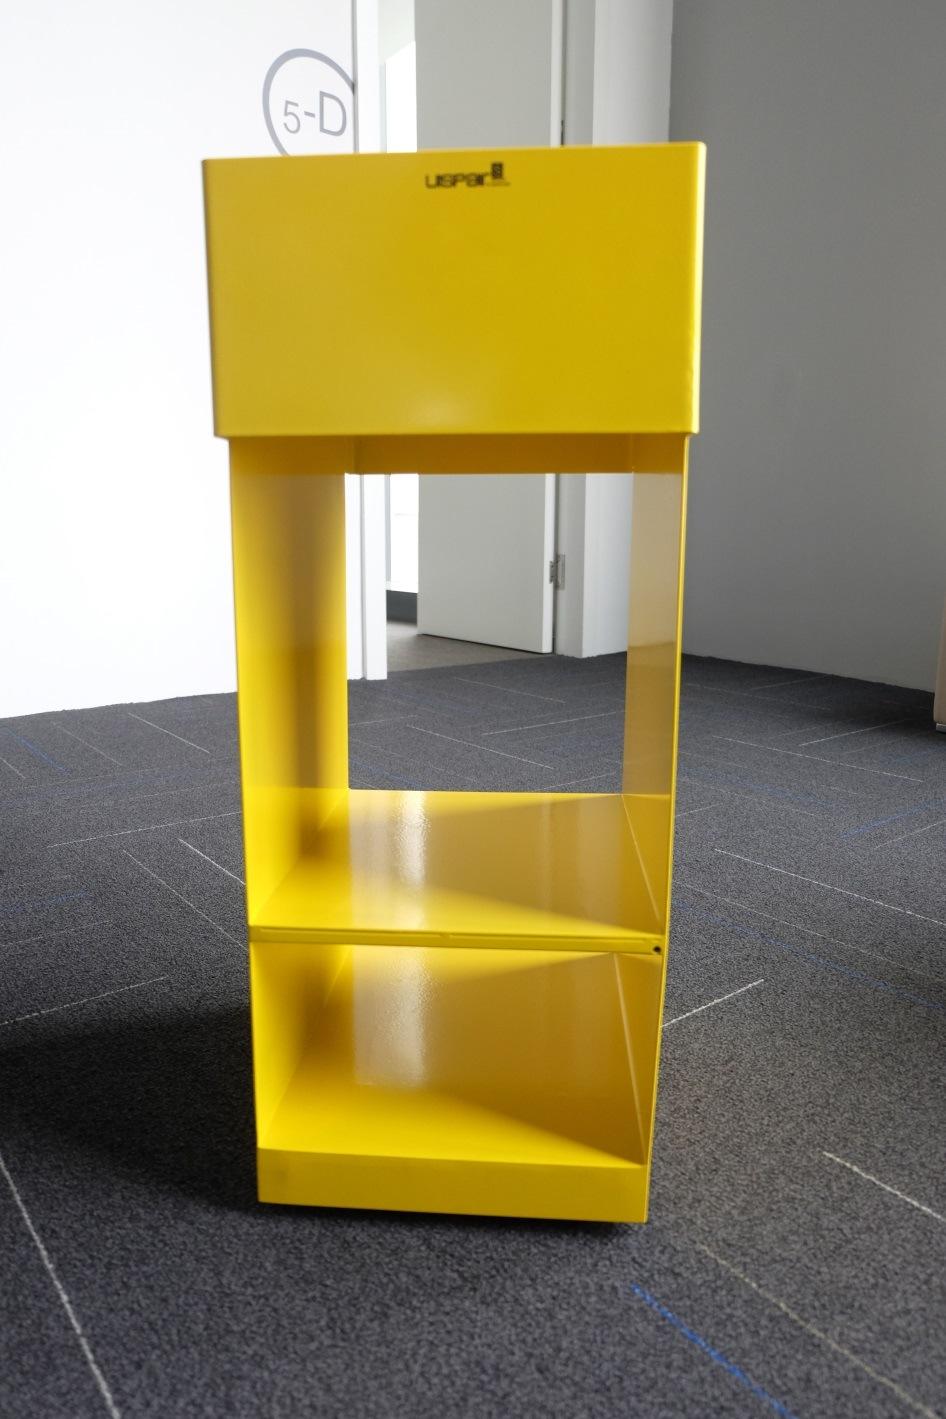 Uispair 100% Steel Office Supplies Office Stationery for Item Storage